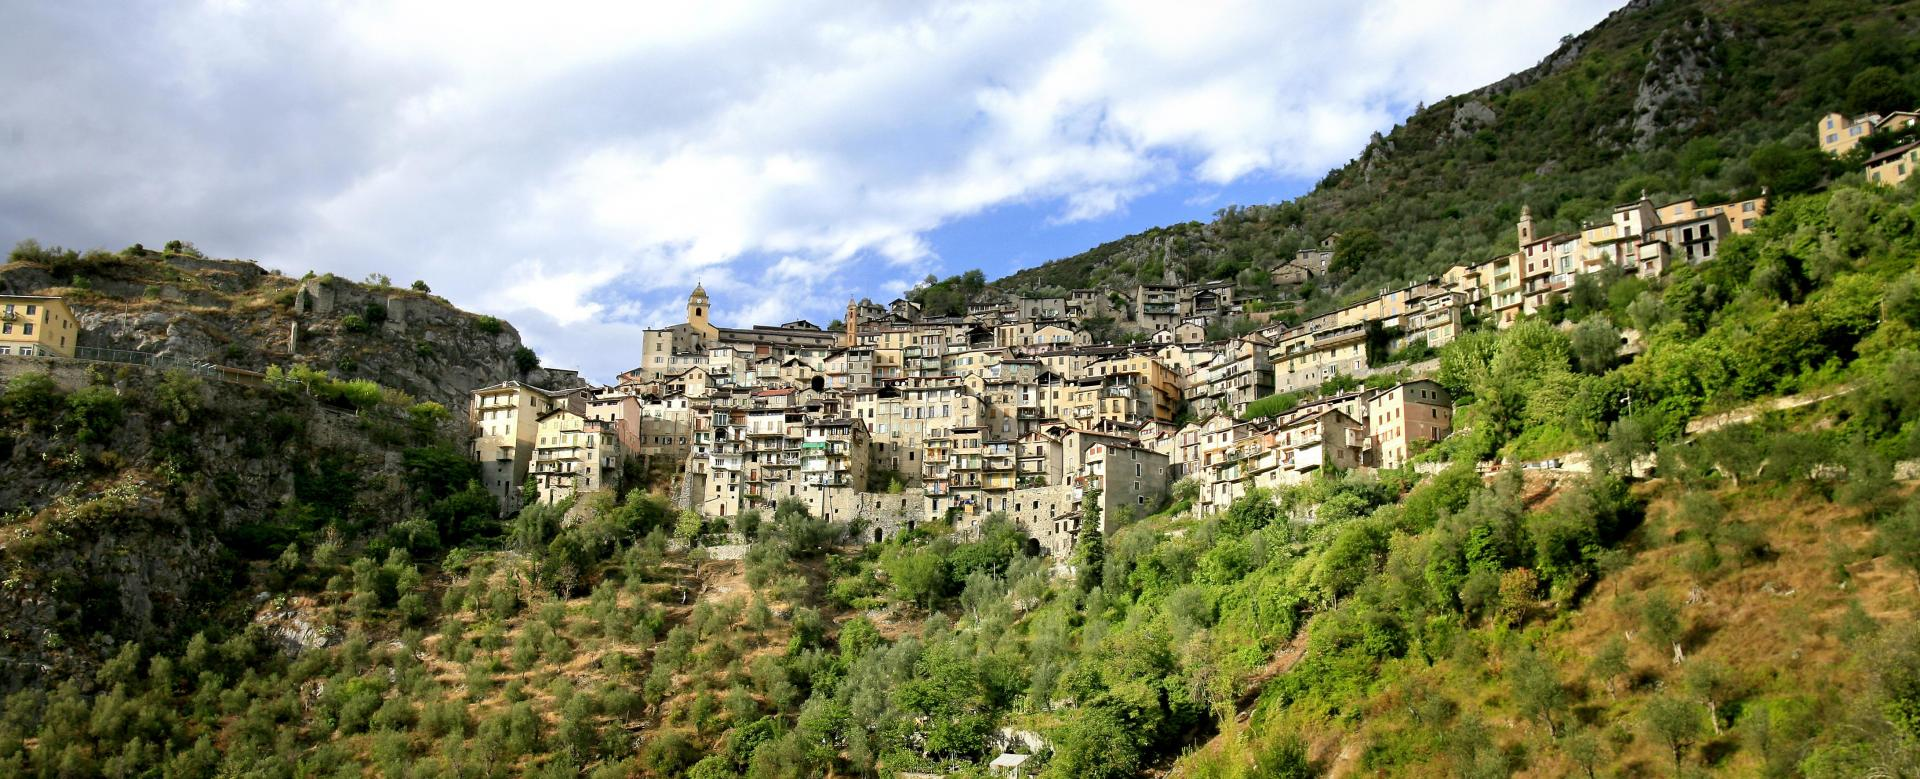 Image Les villages perchés de la roya